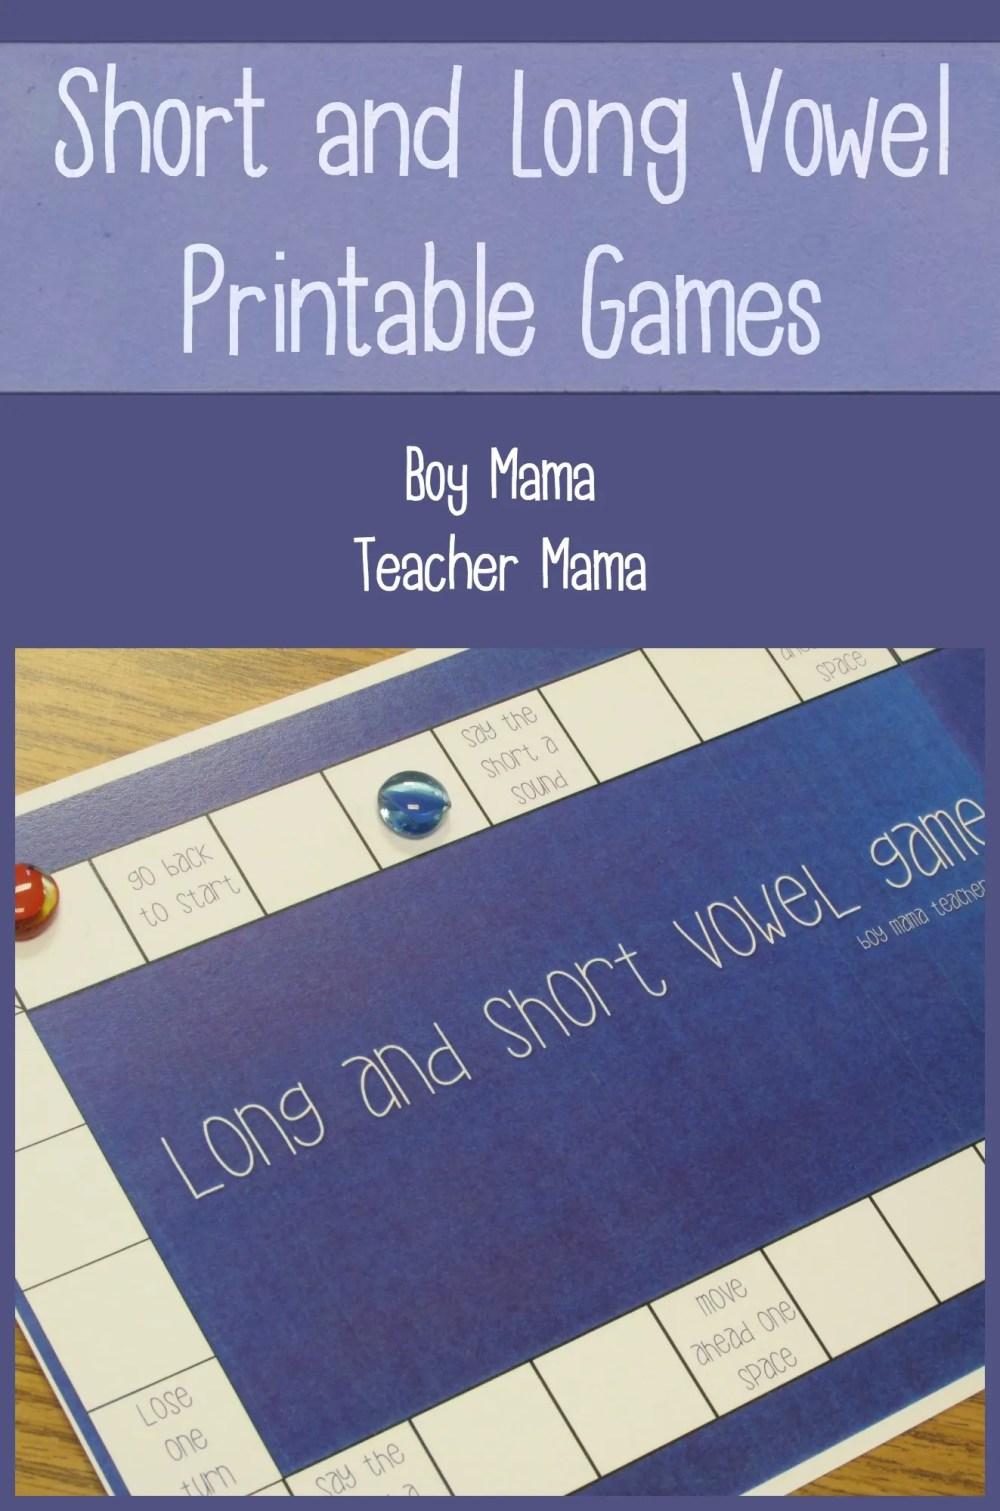 medium resolution of Teacher Mama: Short and Long Vowel Printable Games {After School Linky} -  Boy Mama Teacher Mama